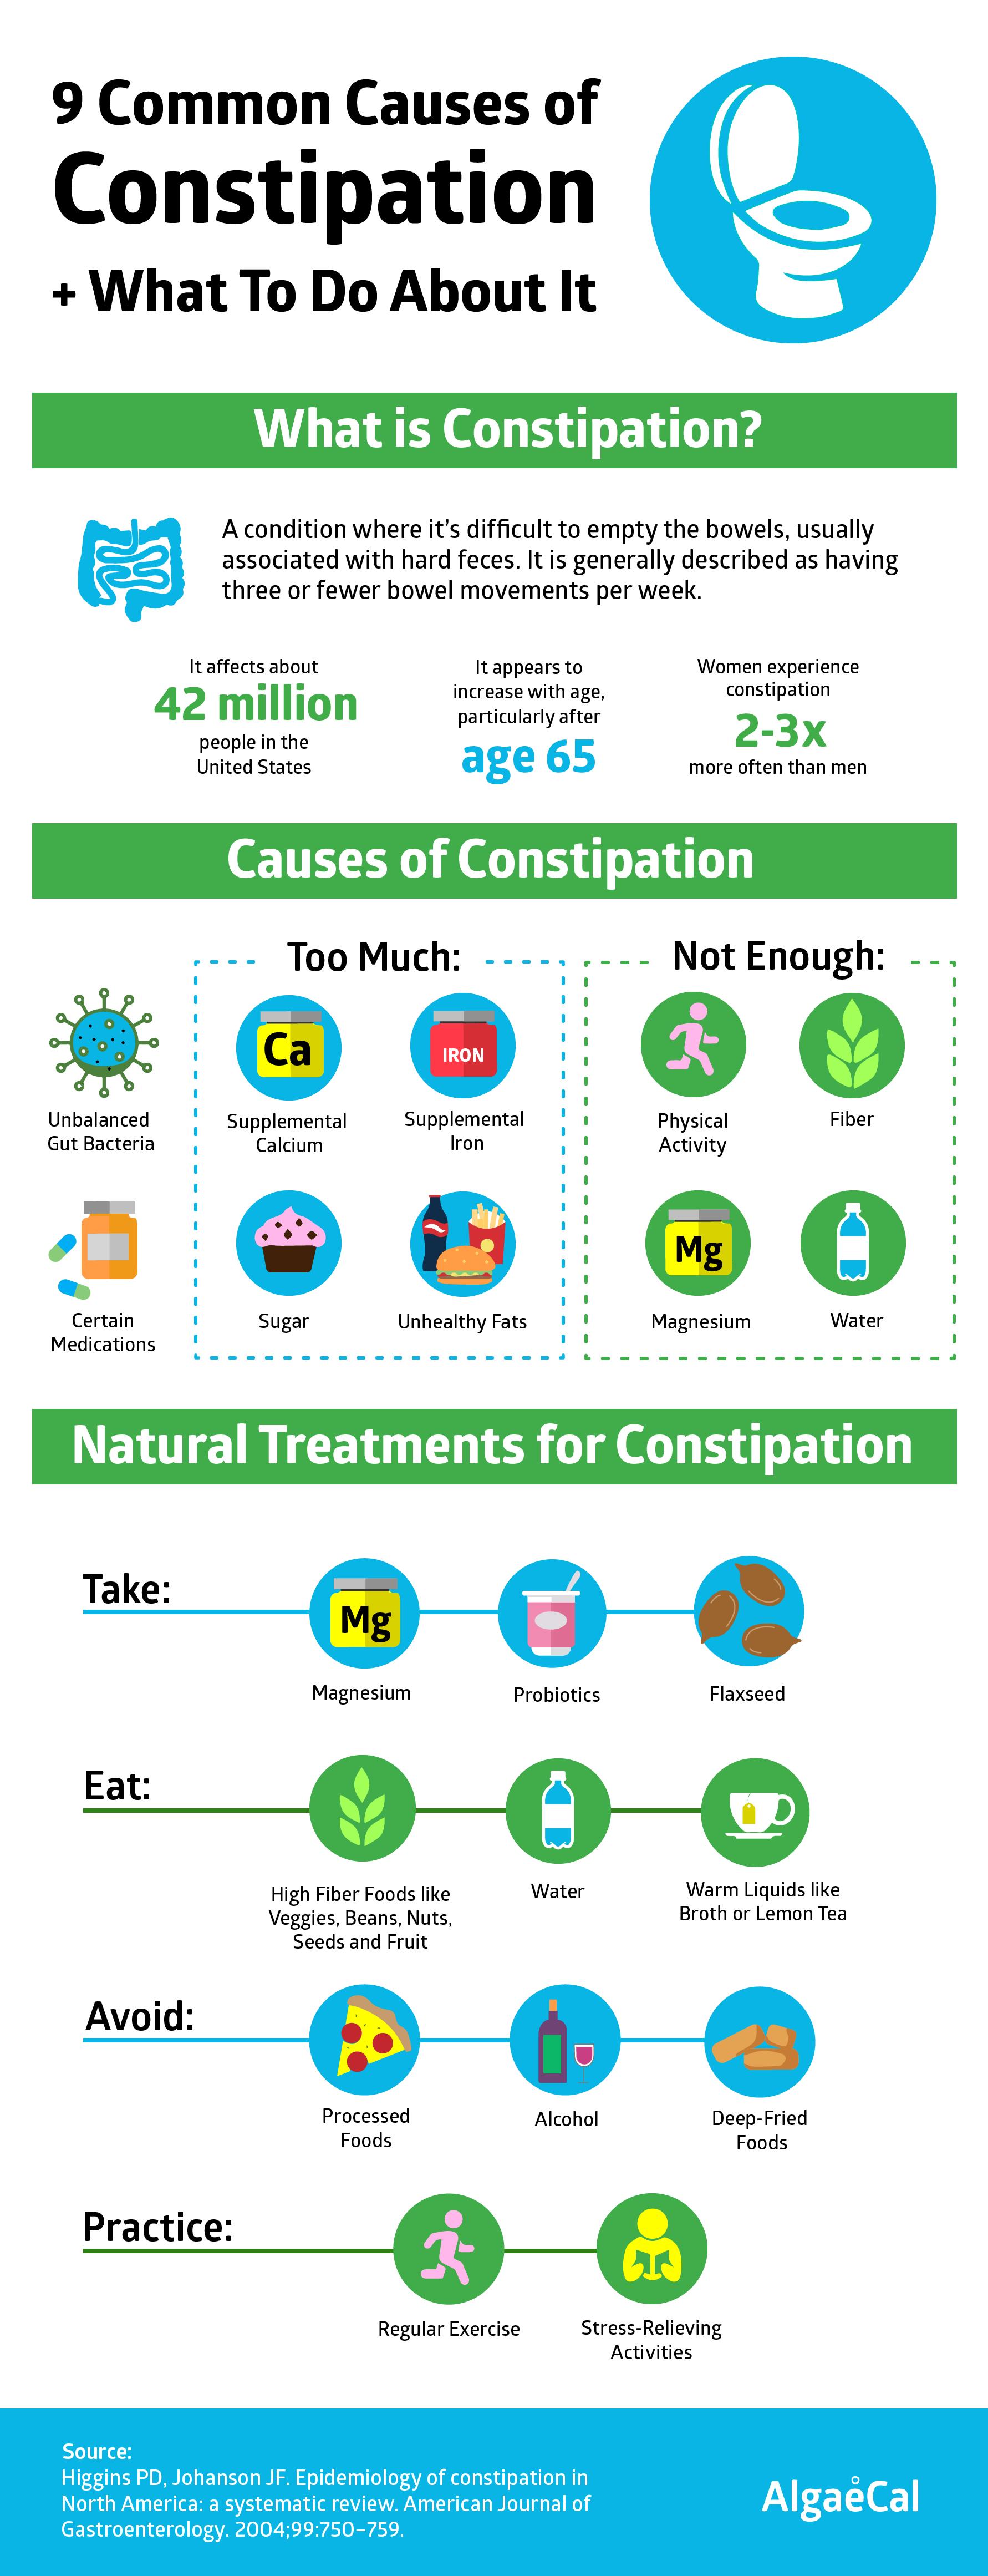 do diet pills cause constipation